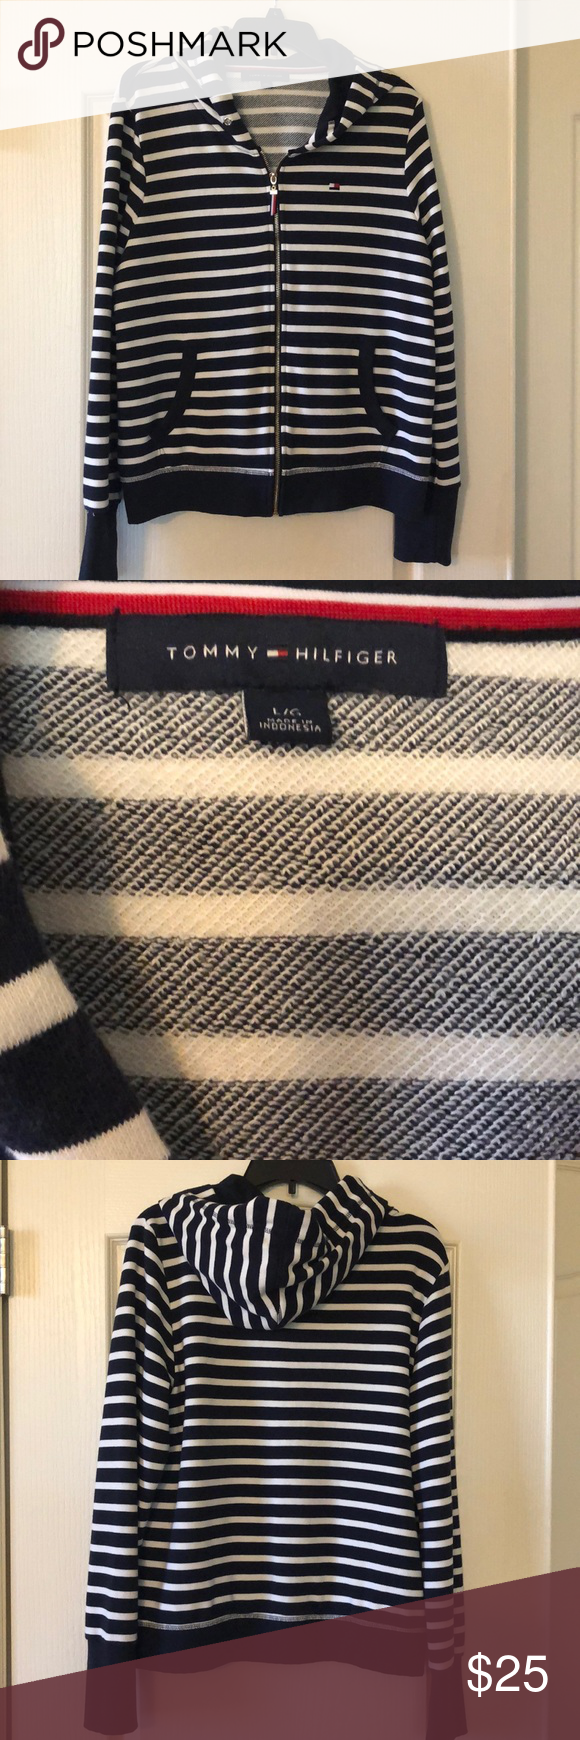 Tommy Hilfiger striped zip up hoodie Tommy hilfiger